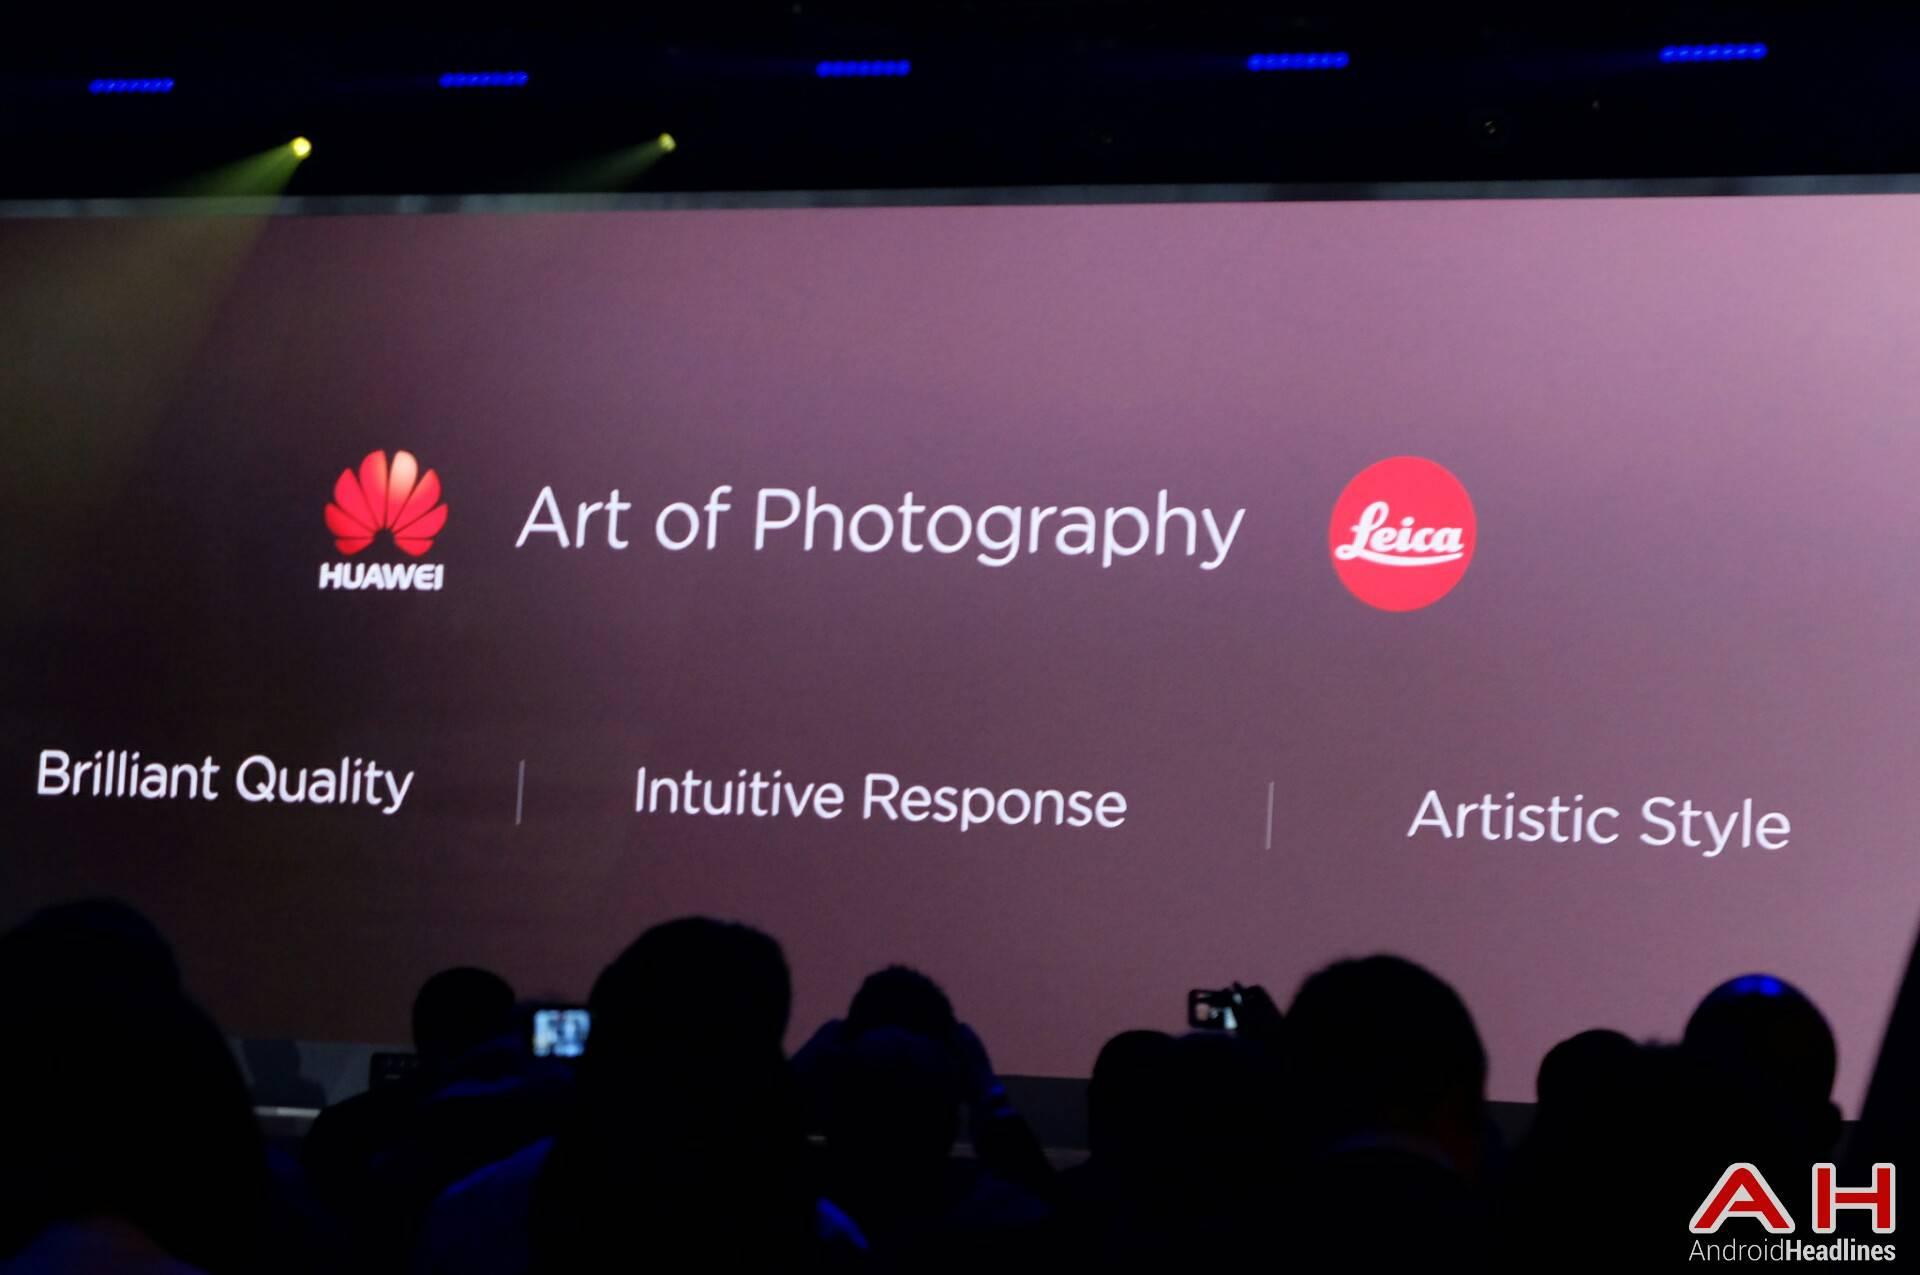 Huawei P9 camera 2